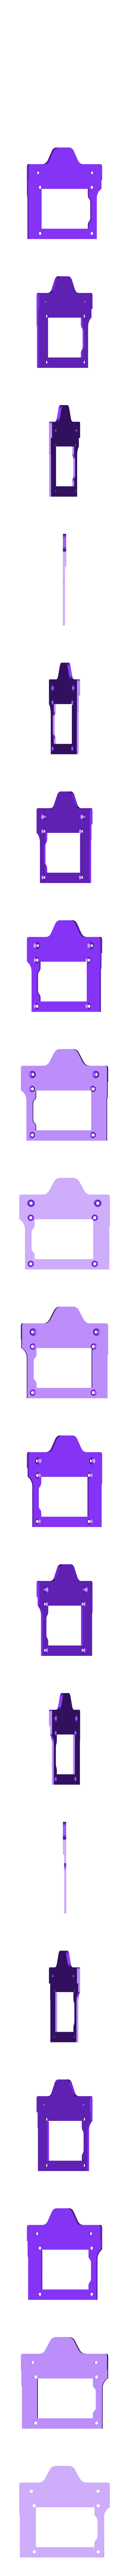 lower brace.stl Download free STL file 1991 Mazda 787B 3d Printed RC Car • 3D printable template, brett